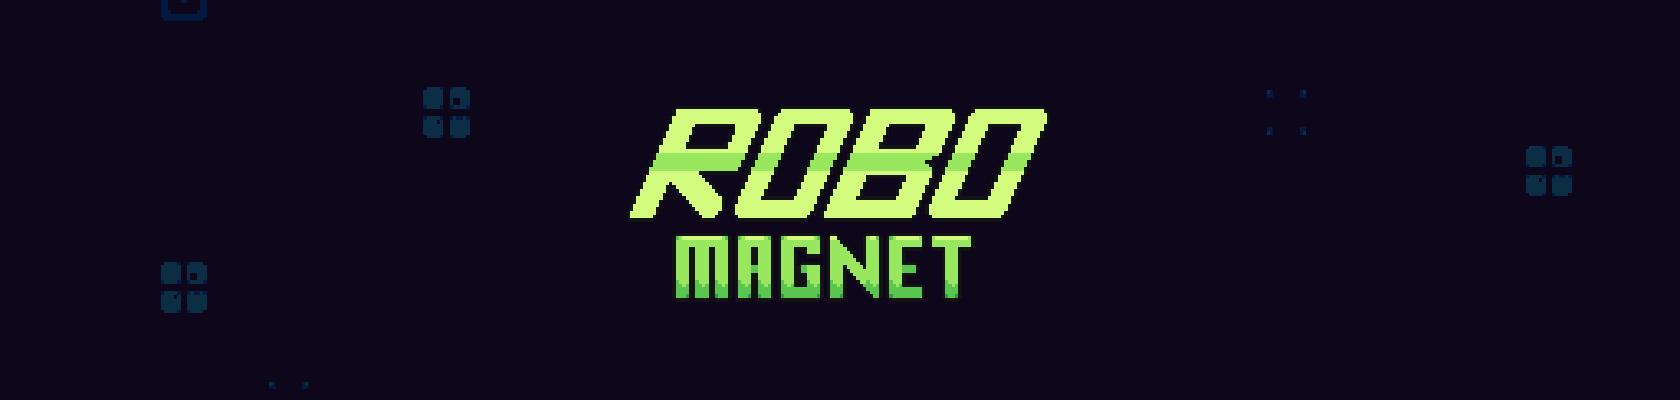 Robo Magnet